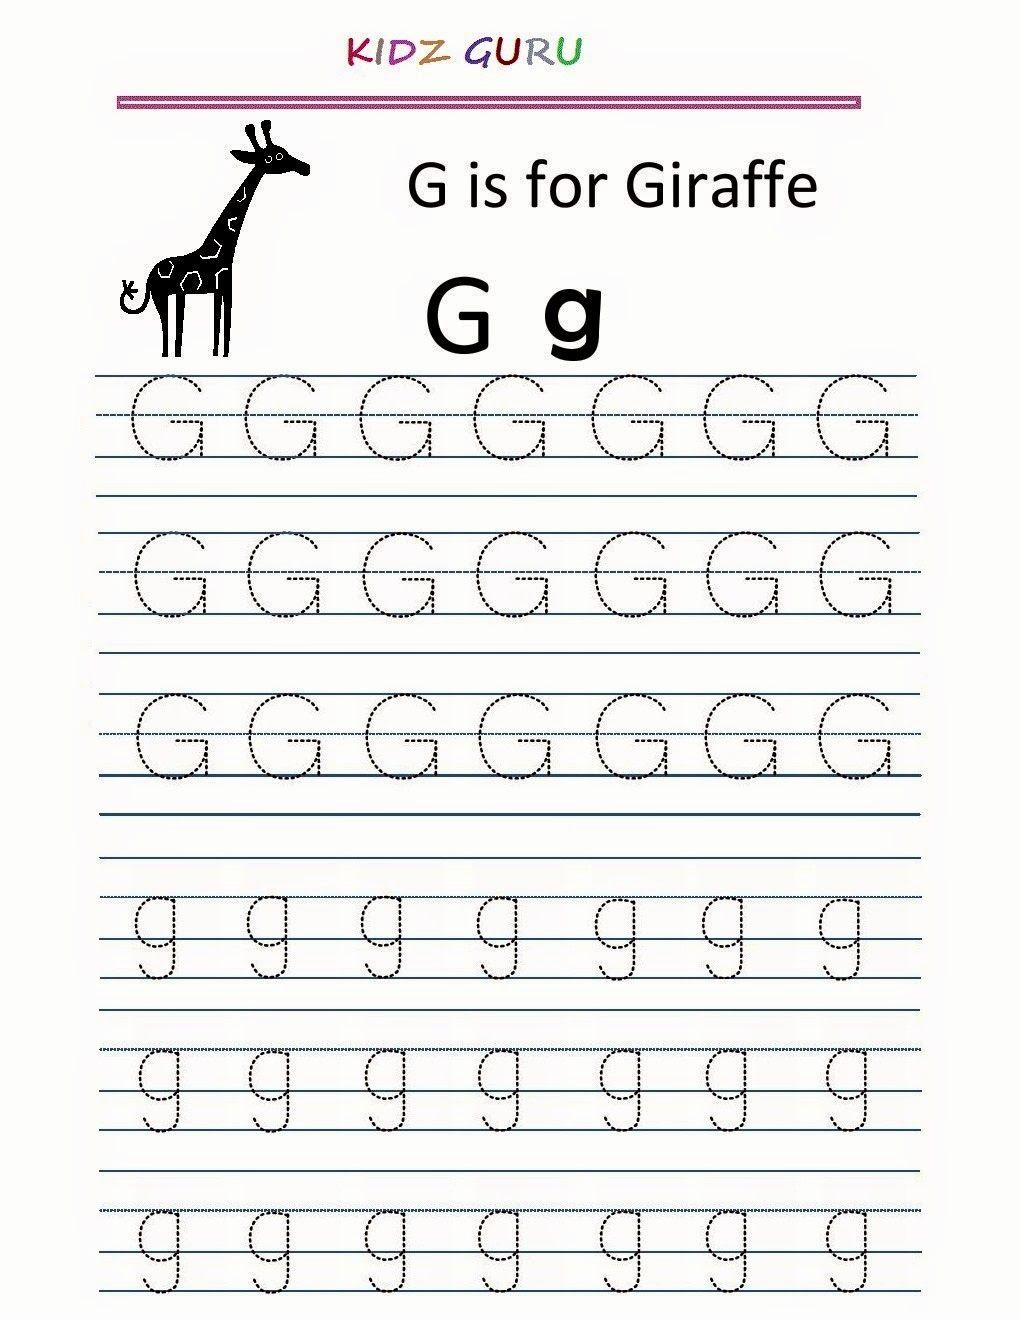 Free Letter Worksheets For Preschoolers In 2020 Handwriting Worksheets For Kindergarten Alphabet Worksheets Preschool Alphabet Writing Worksheets [ 1320 x 1020 Pixel ]